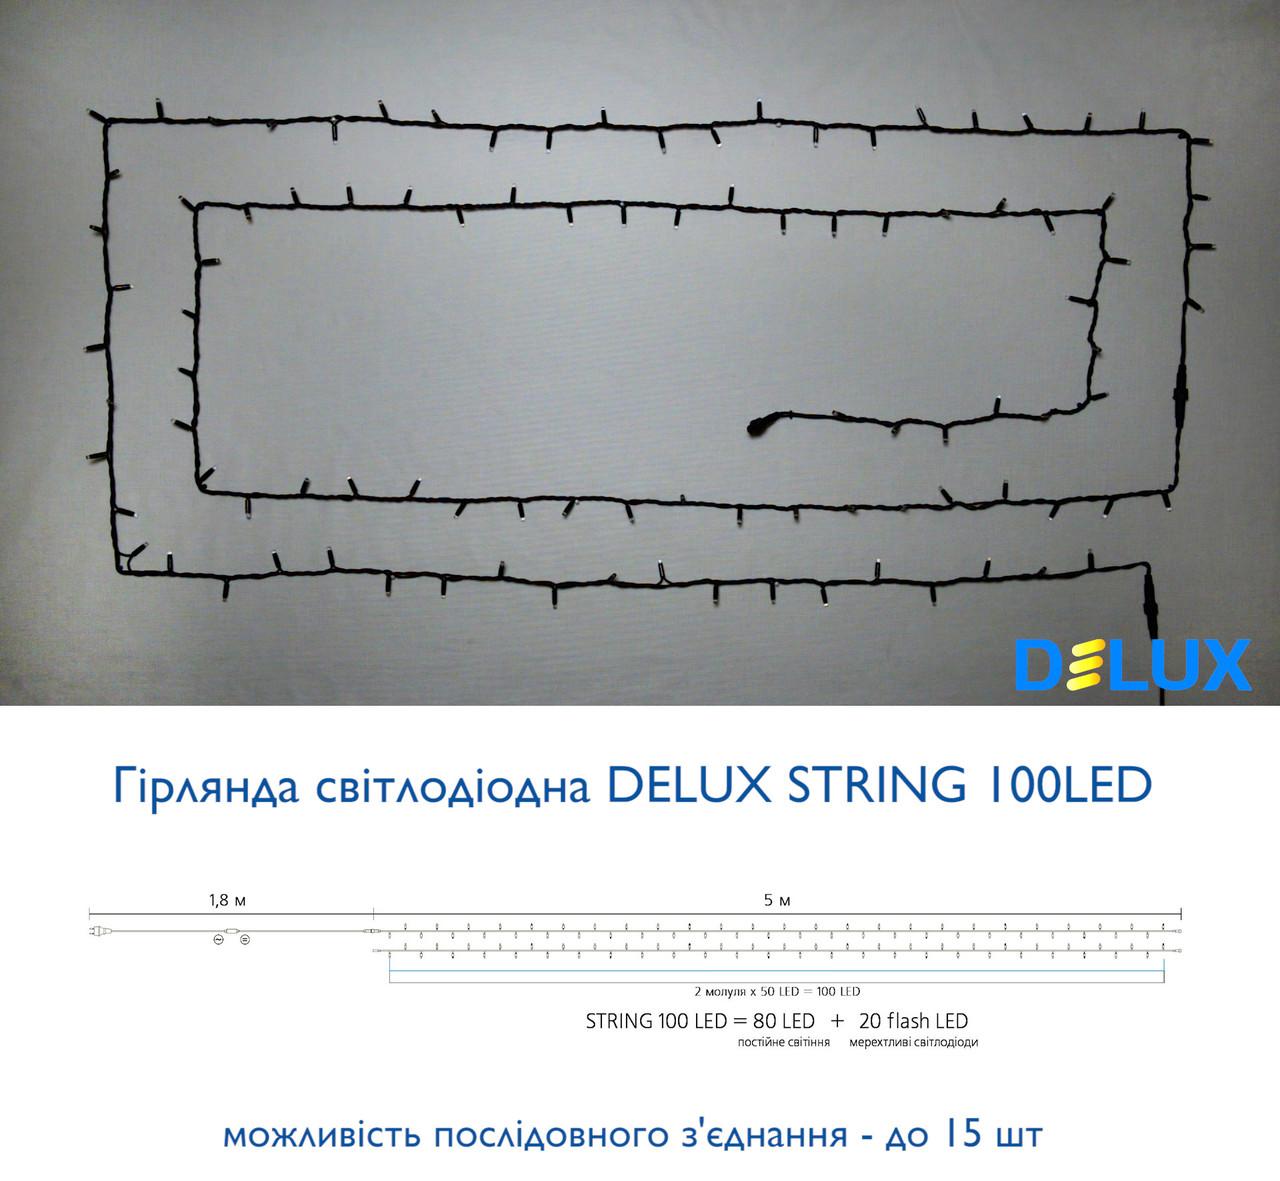 Гирлянда уличная DELUX STRING 100LED 10m (2*5m) 20 flash синий/черн IP44 EN